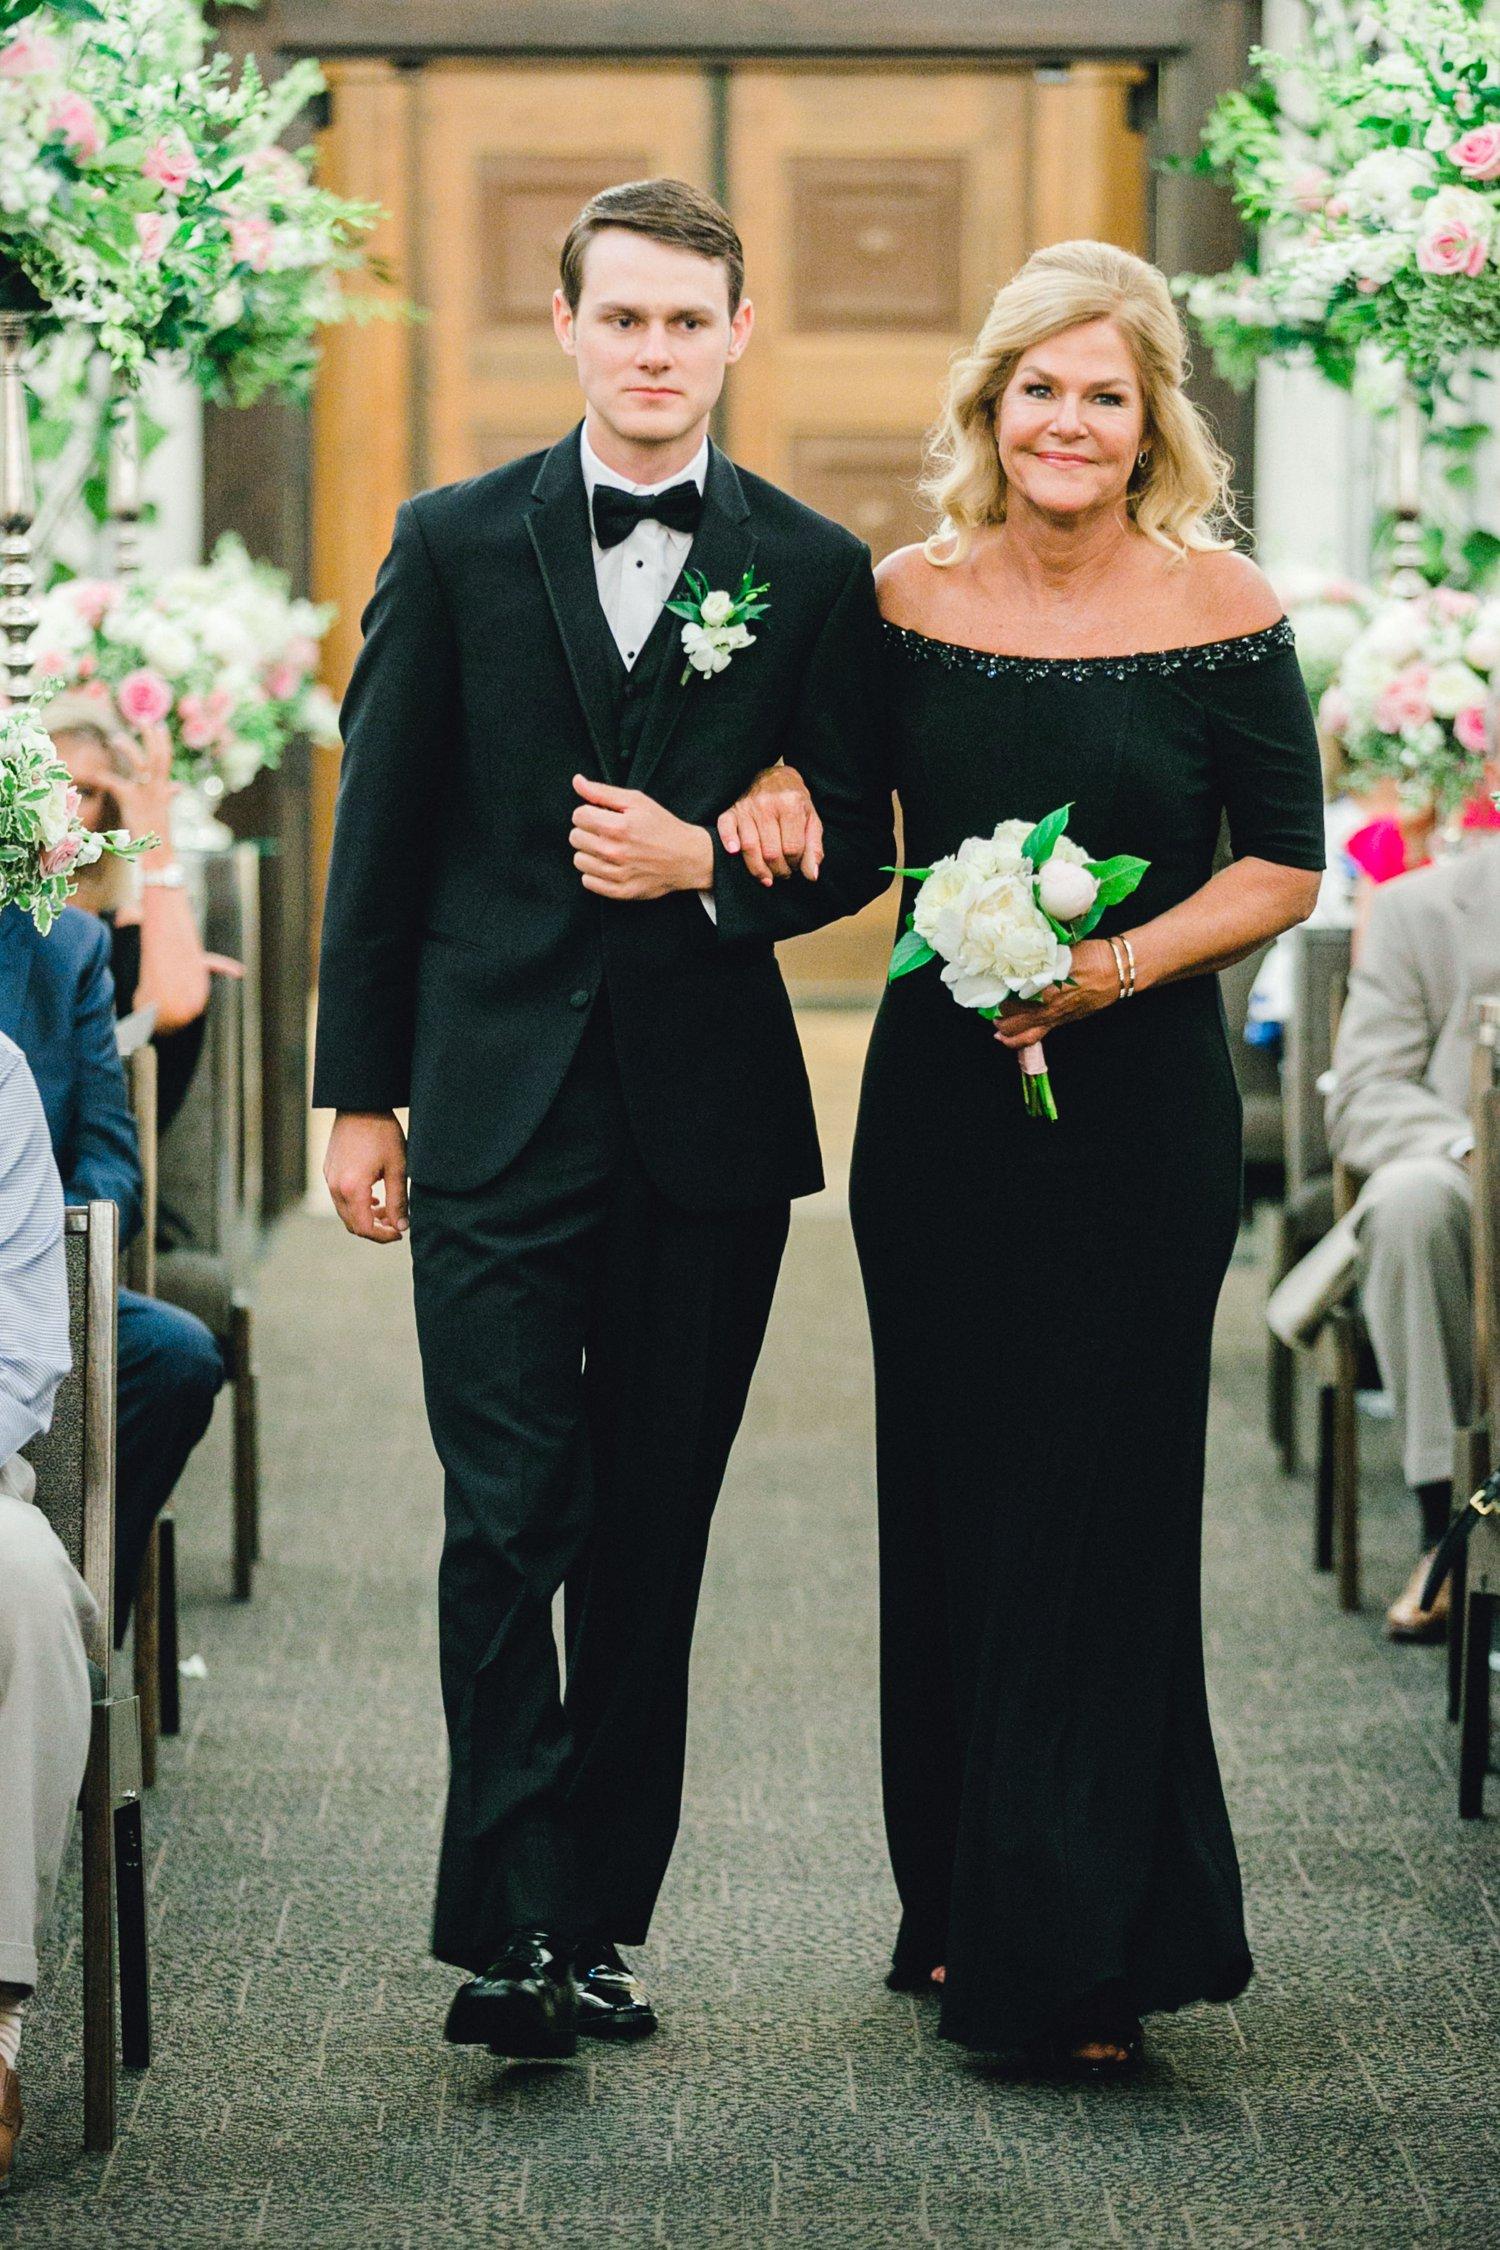 Taylor-and-Brock-Williams-Texas-Tech-University-Merket-Alumni-Center-Lubbock-Photographer-ALLEEJ0110.jpg